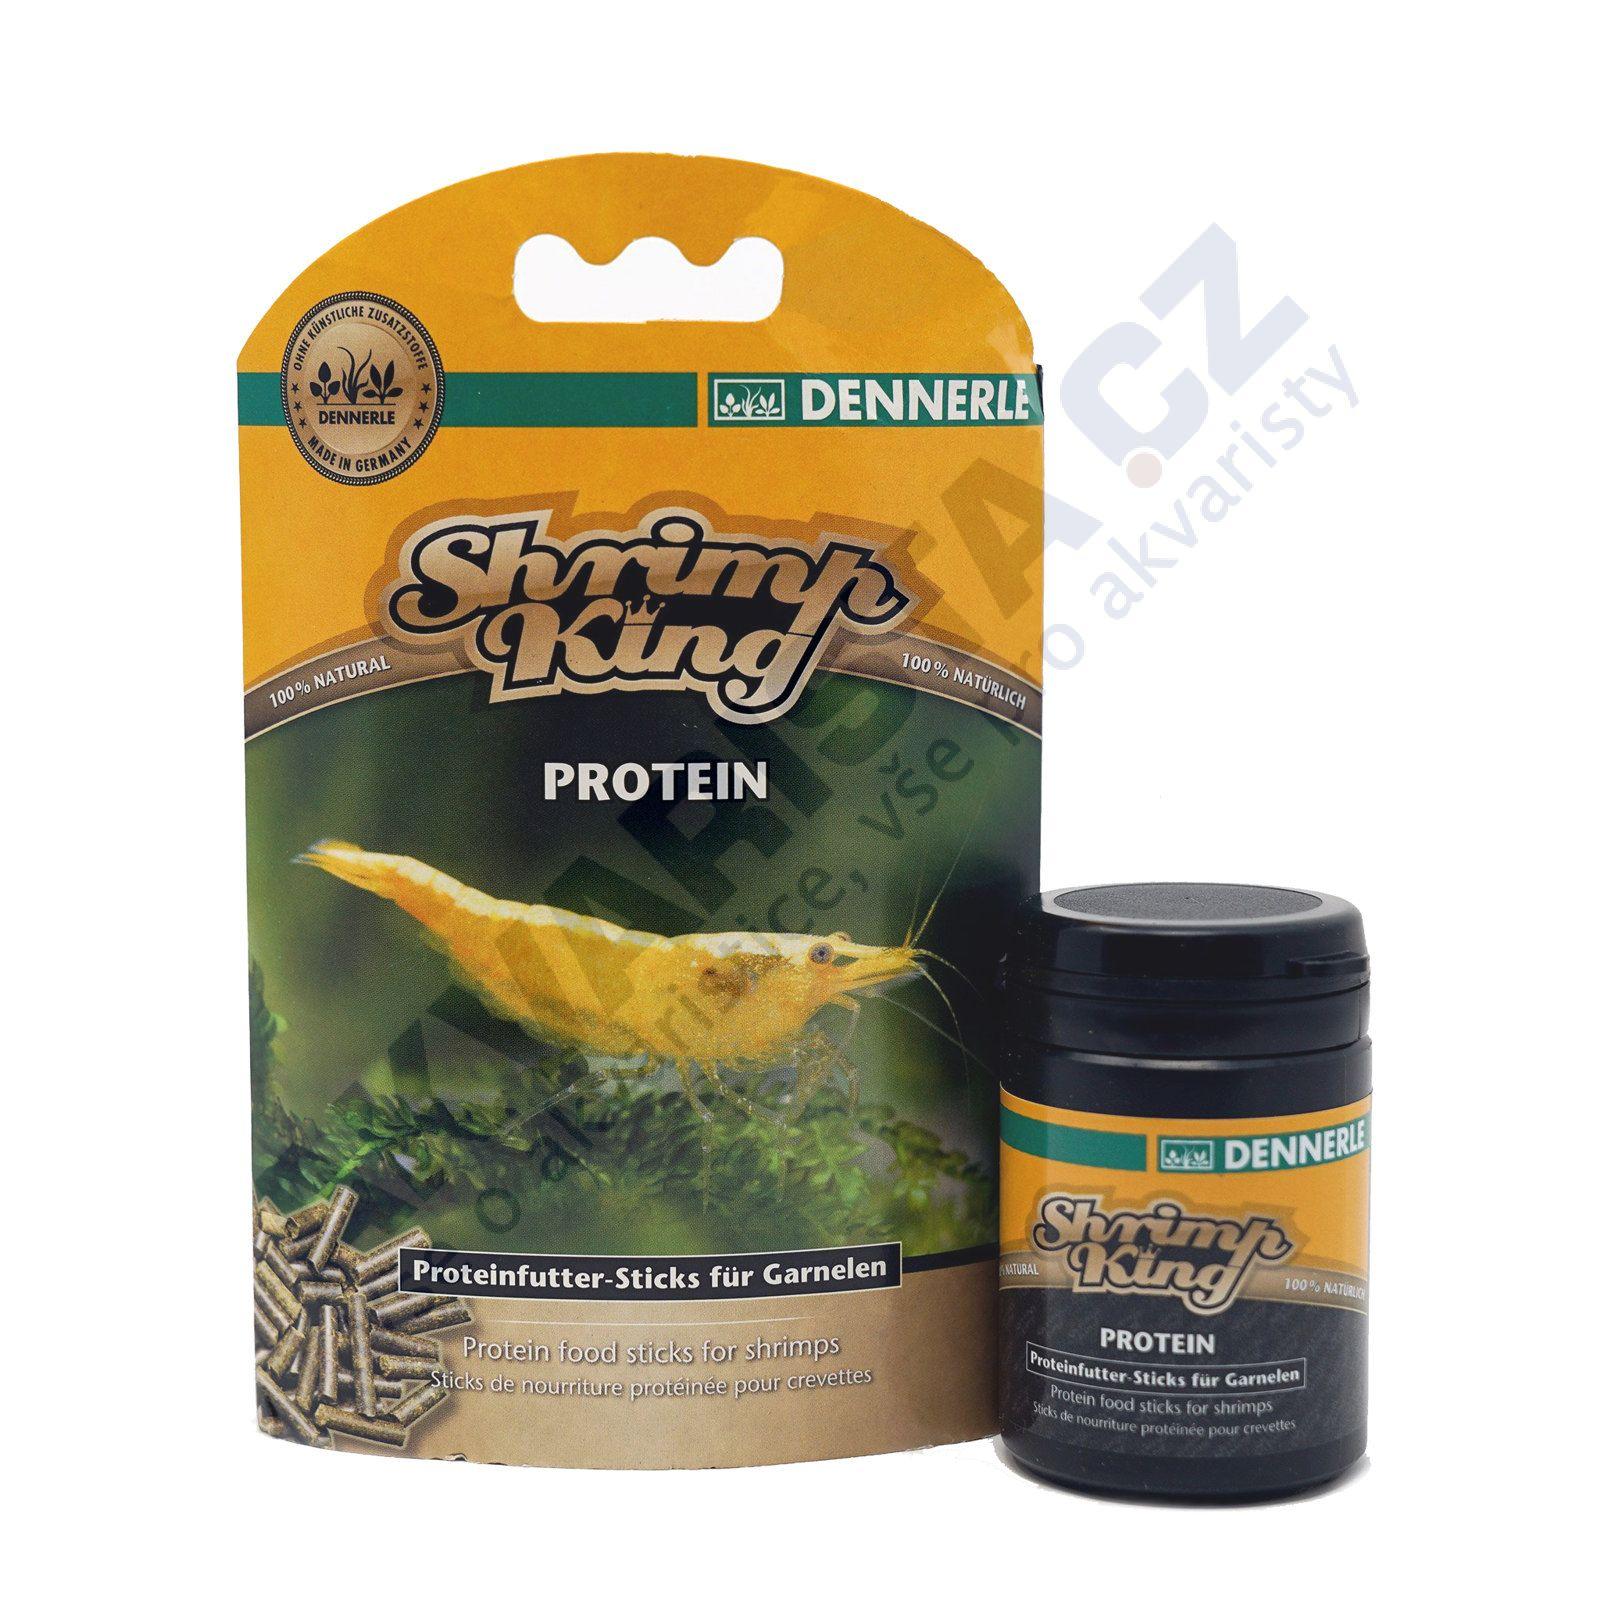 Dennerle Shrimp King protein 45g